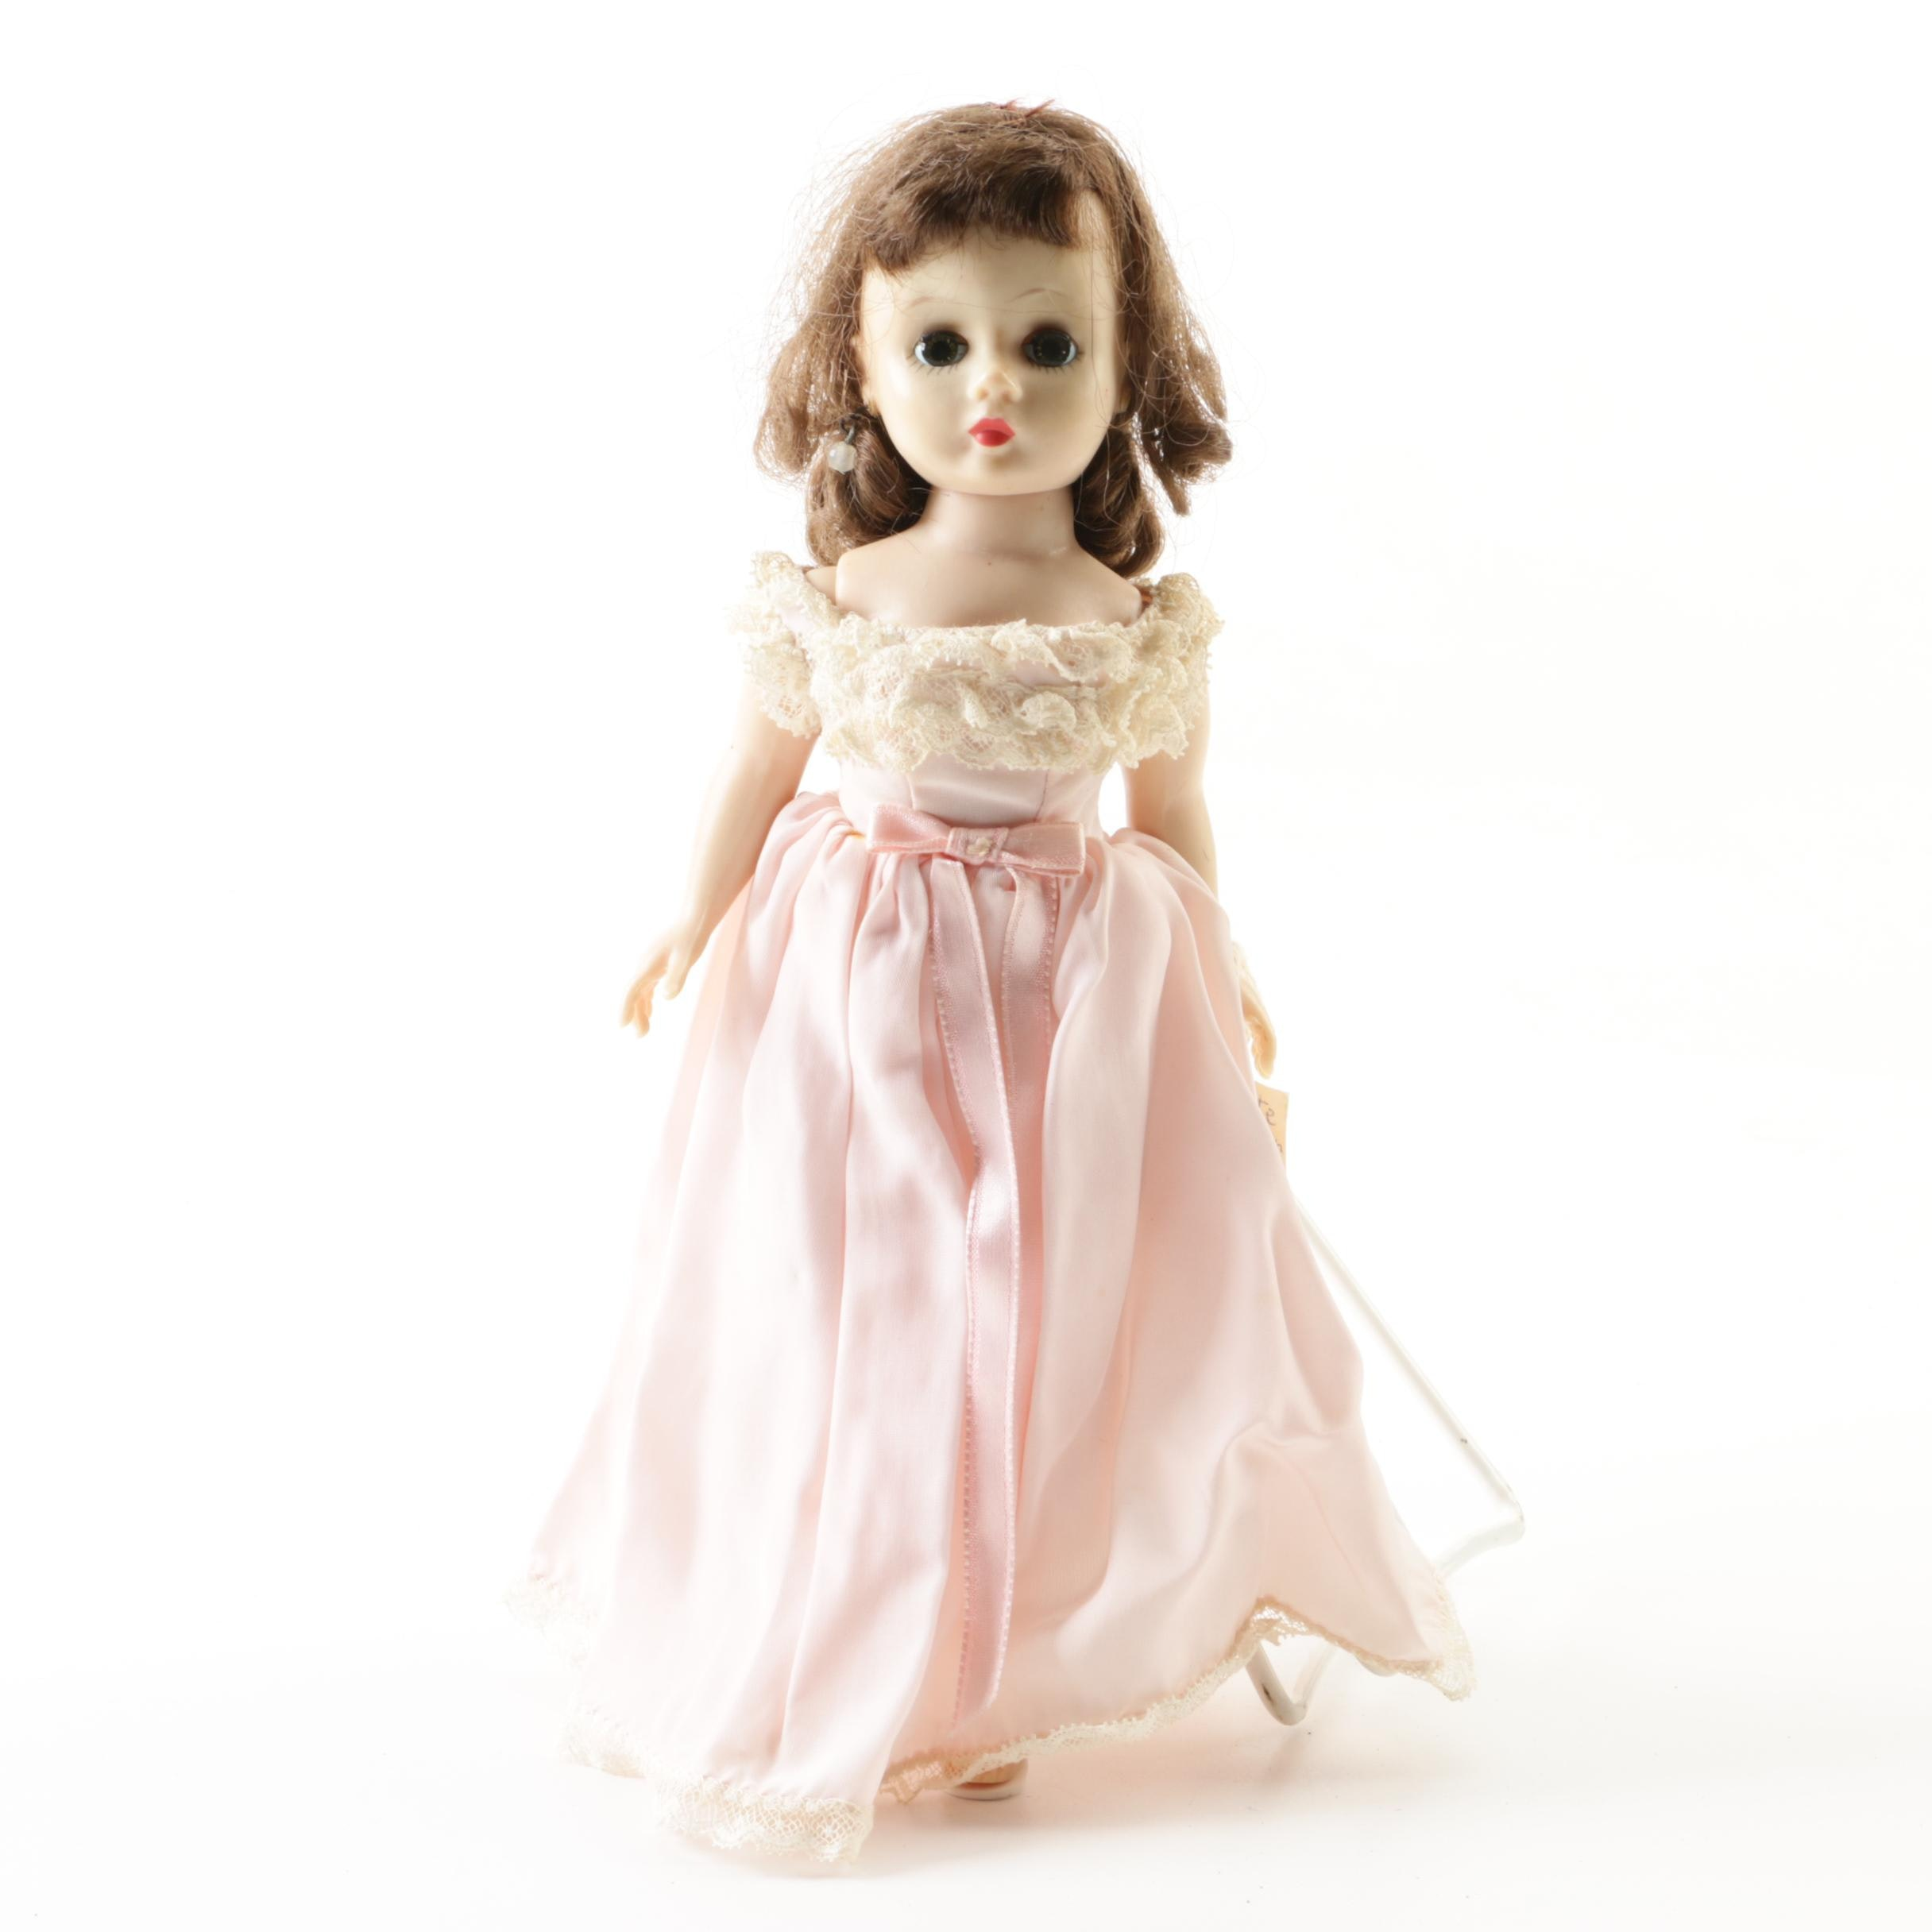 Cissette Plastic Doll by Madame Alexander